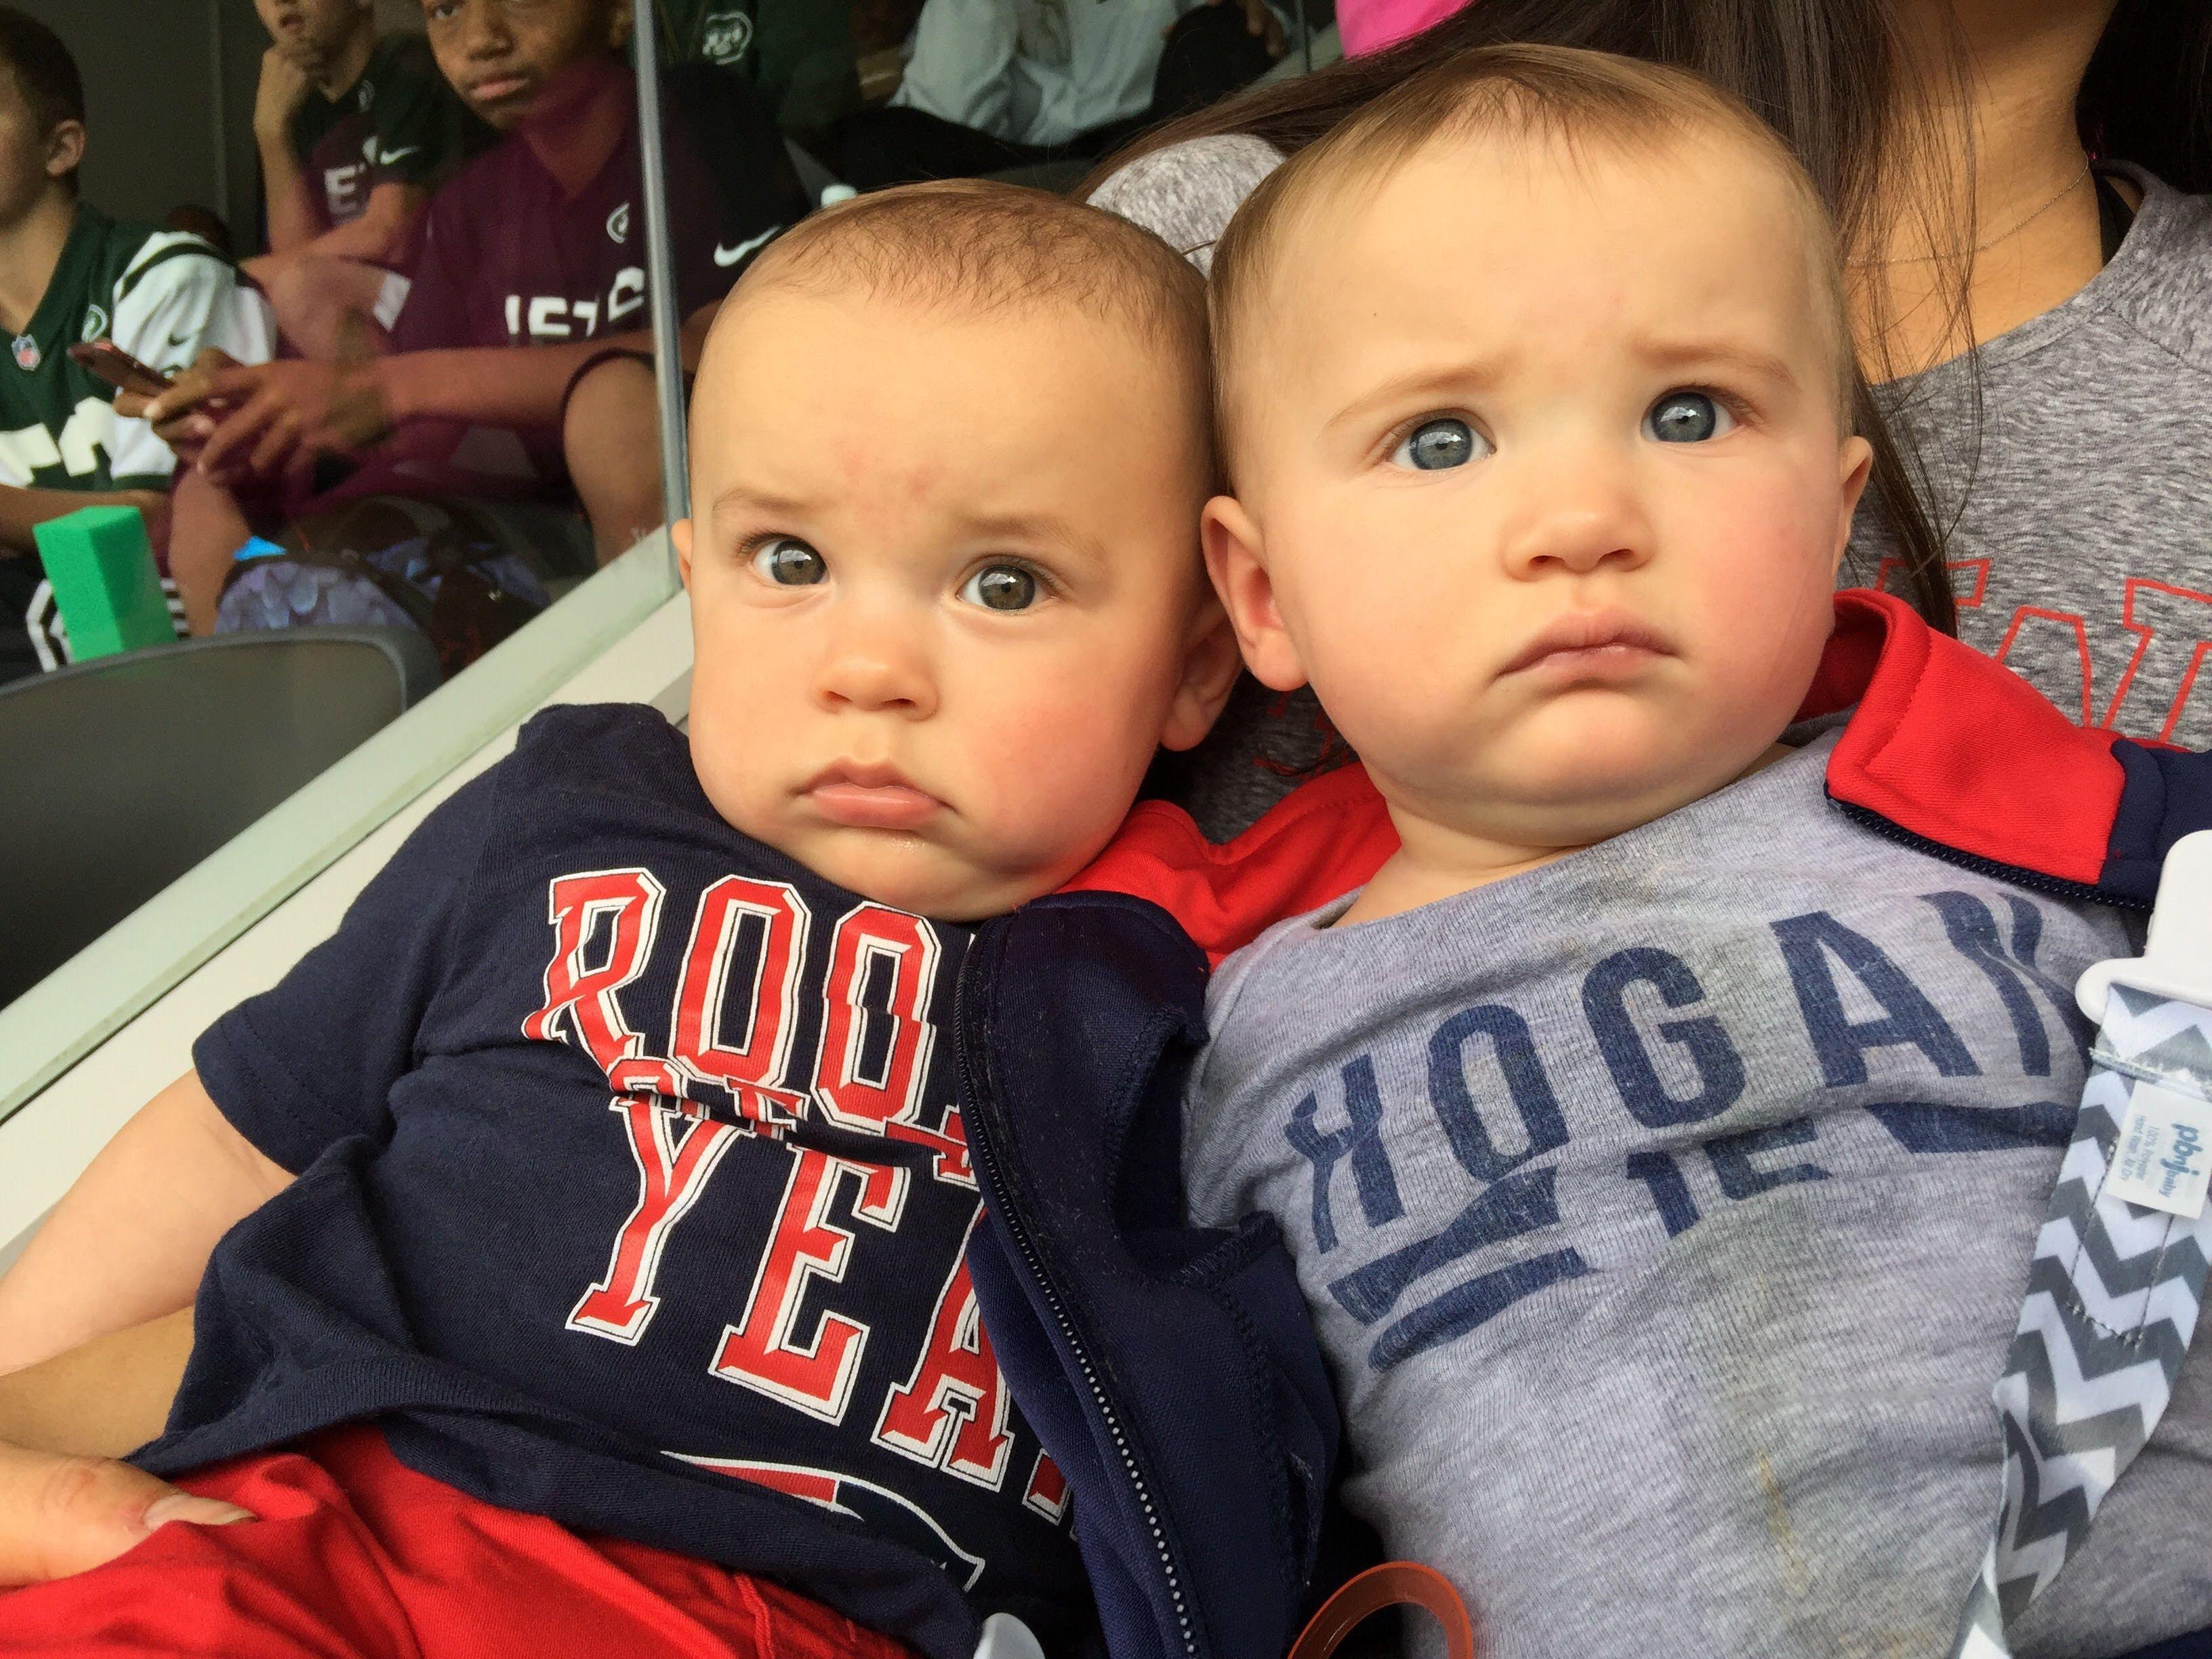 Behind the demanding careers of Chris Hogan and Ashley Boccio, a ...